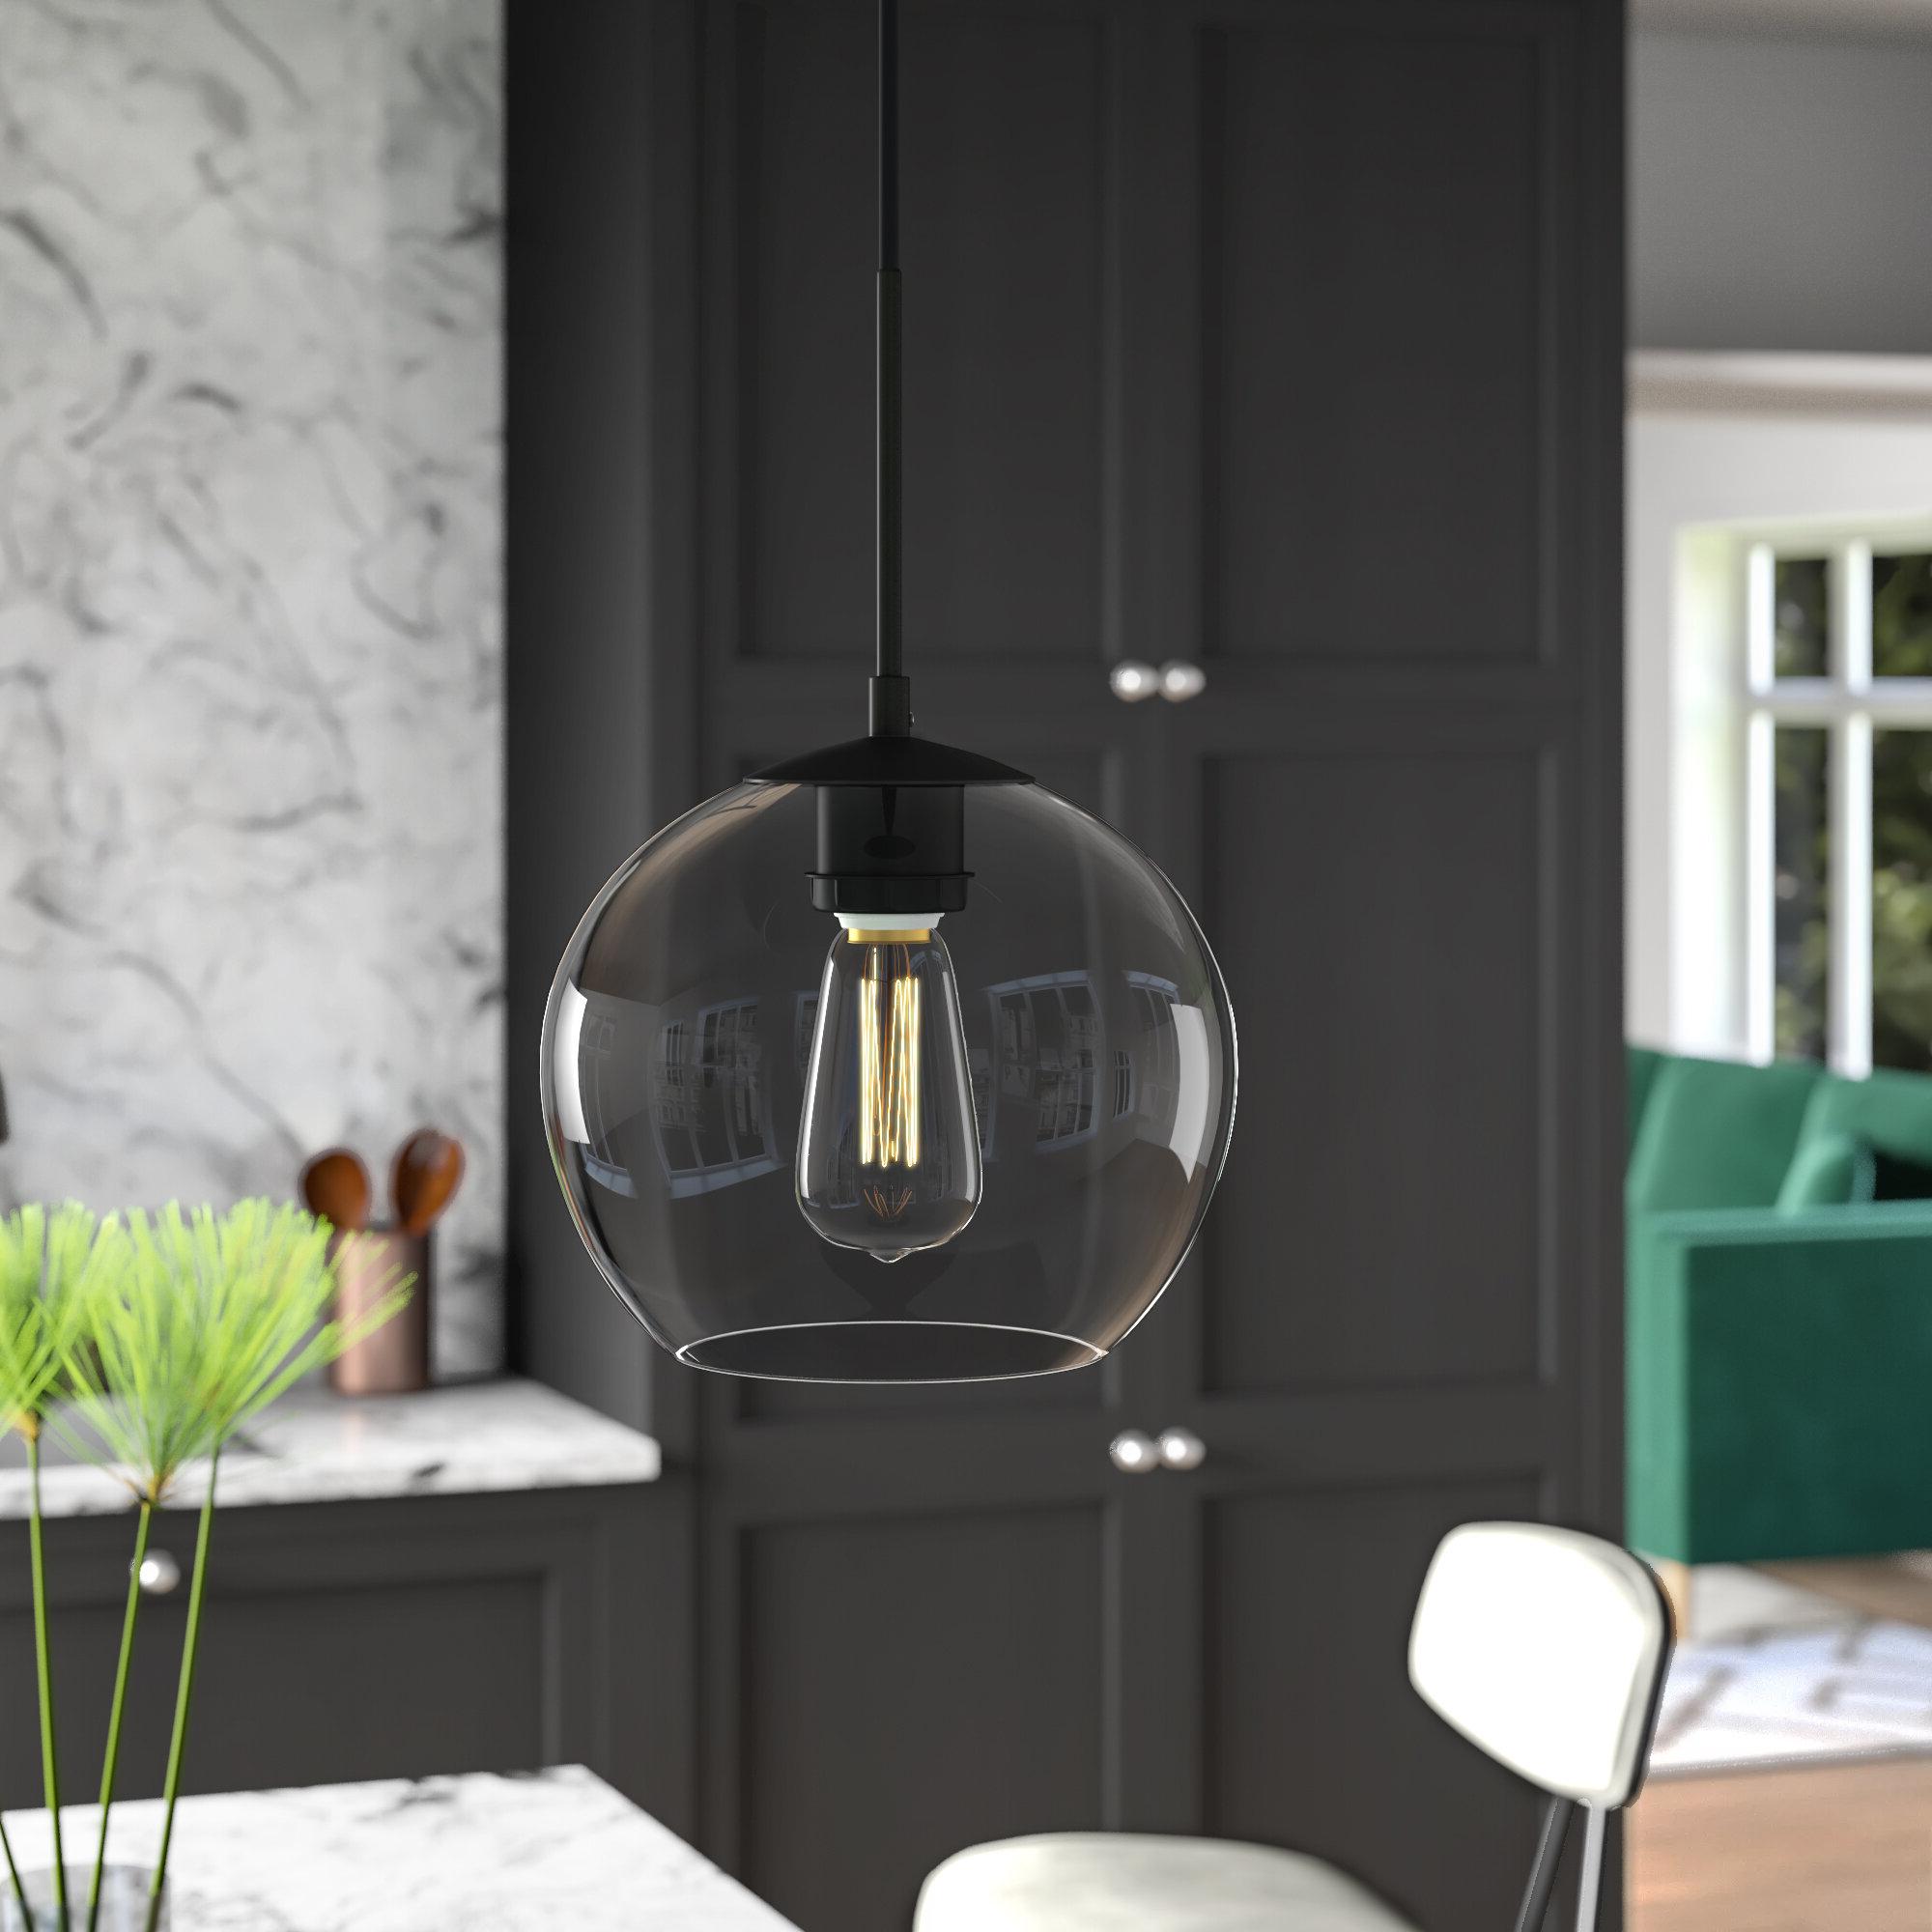 Gehry 1 Light Single Globe Pendants Regarding Fashionable Yearwood 1 Light Single Globe Pendant (View 14 of 25)